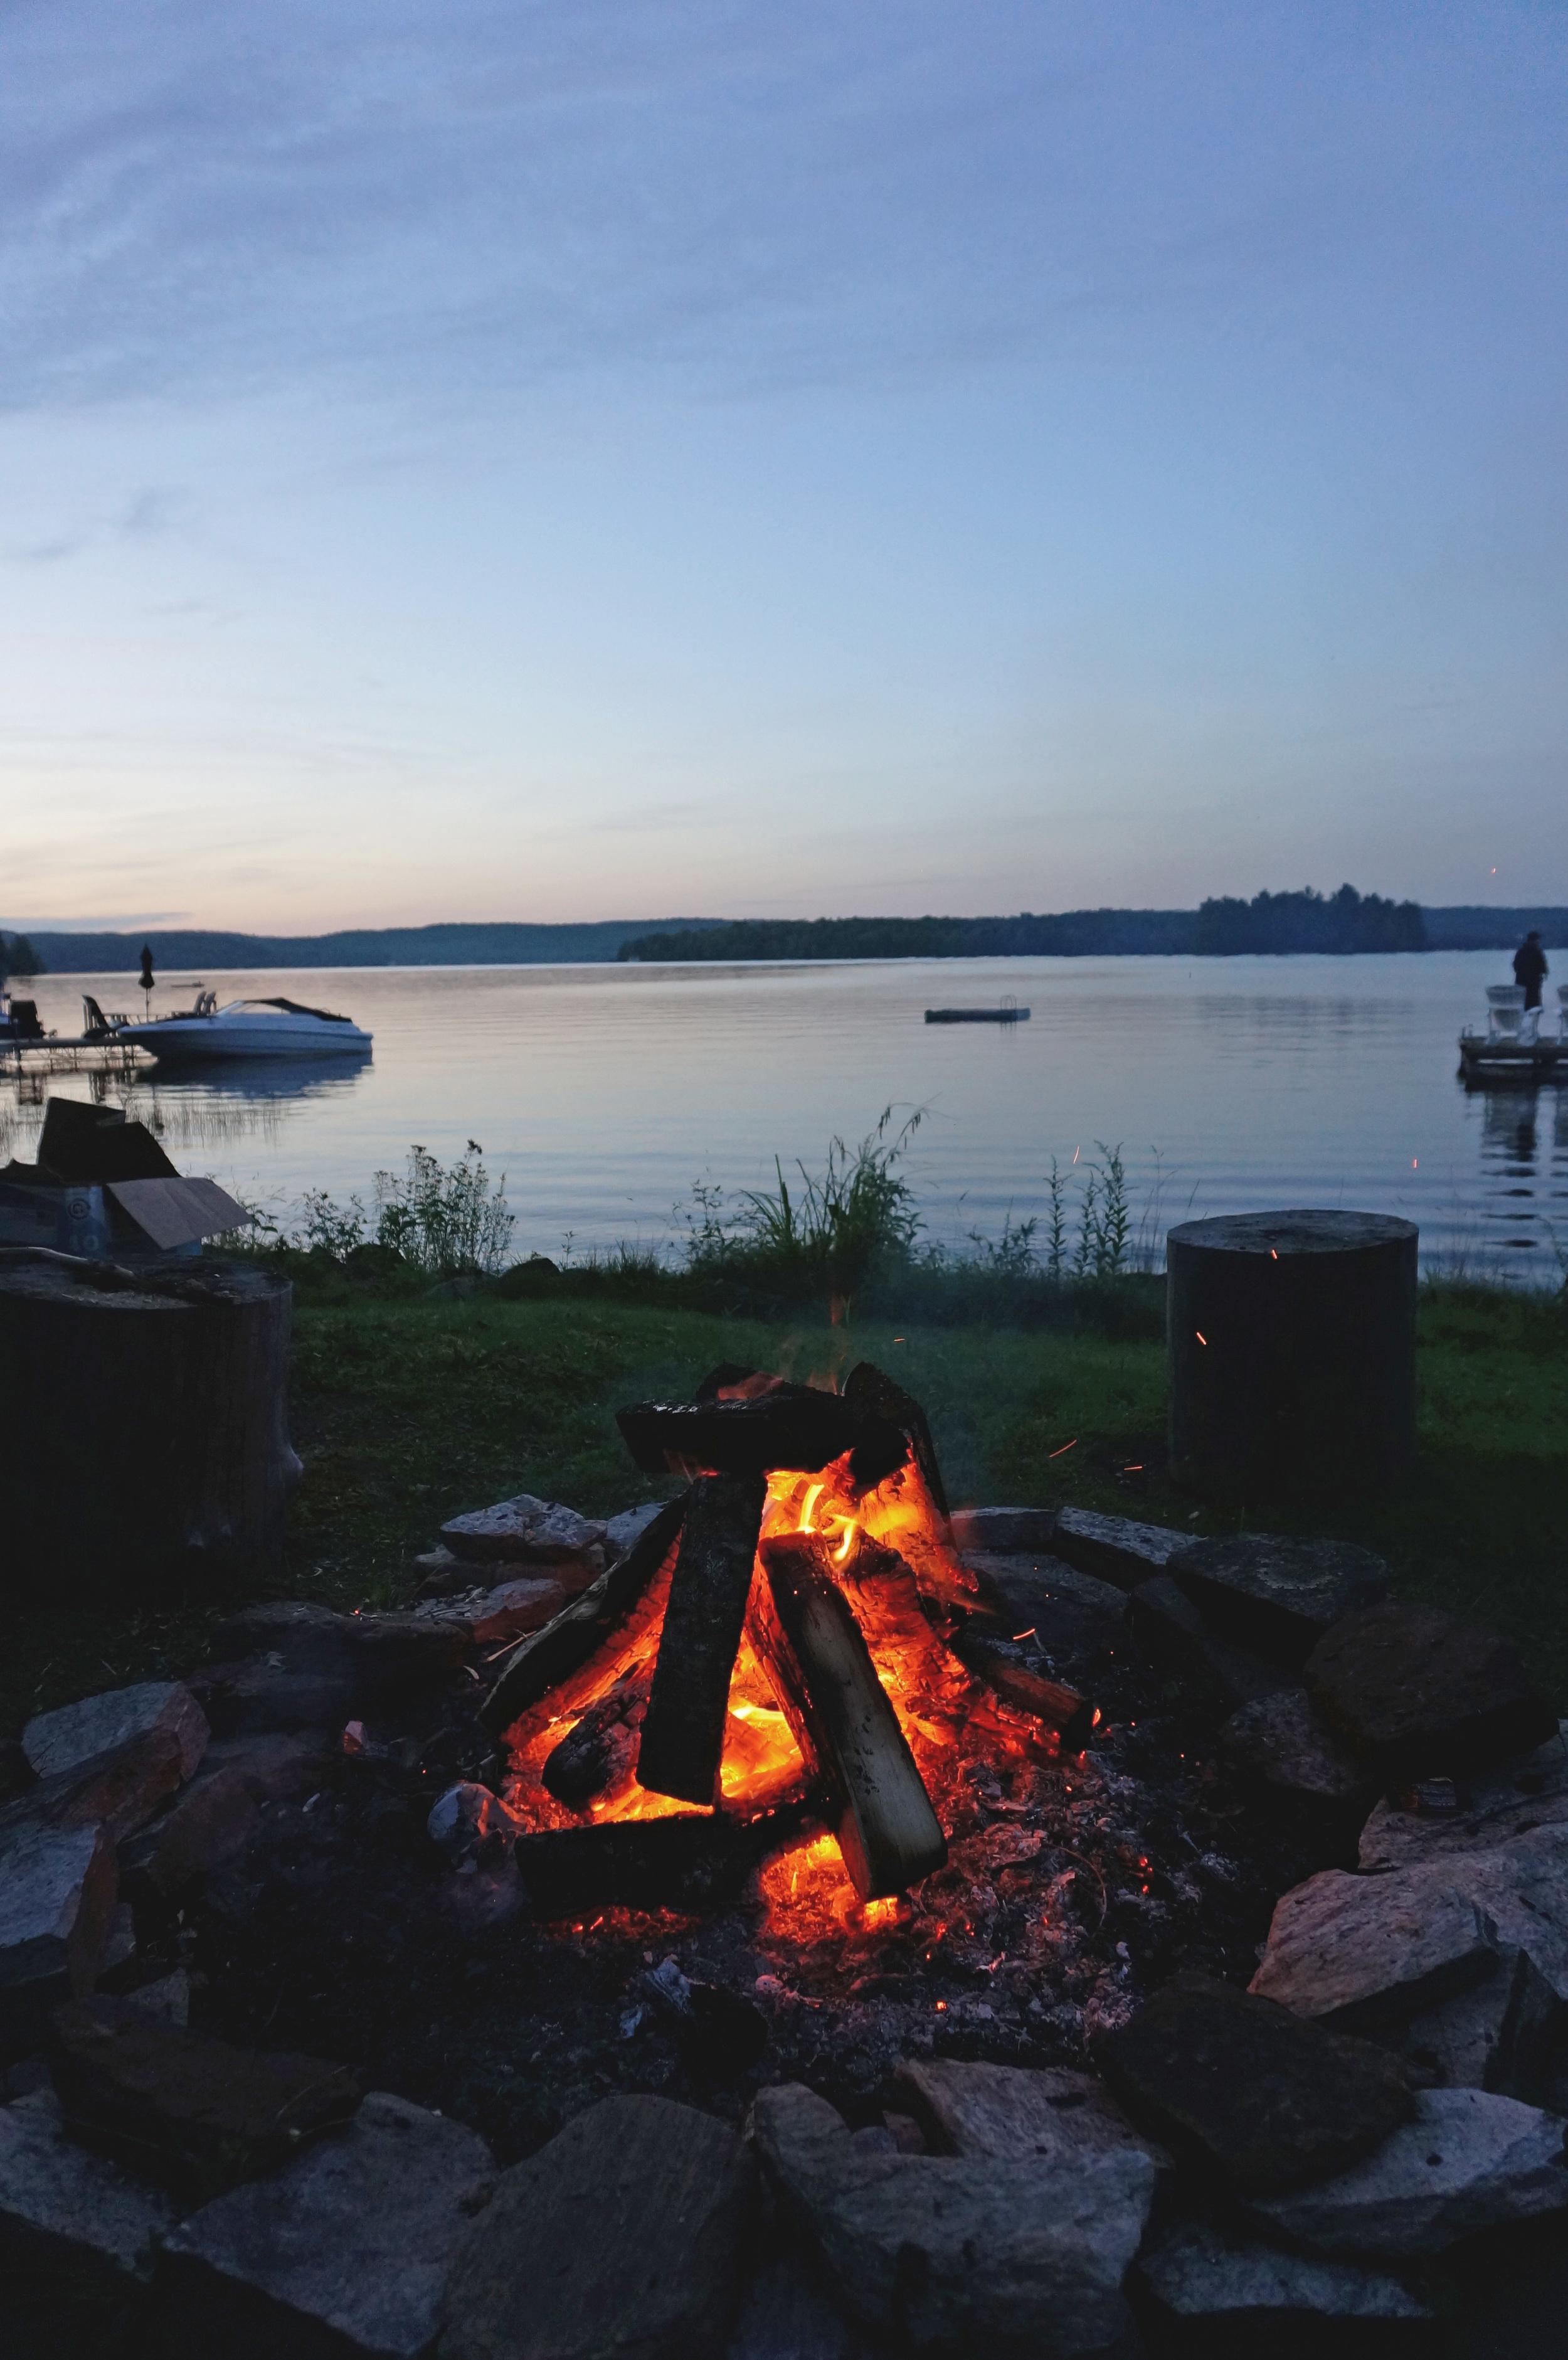 Campire near the lake